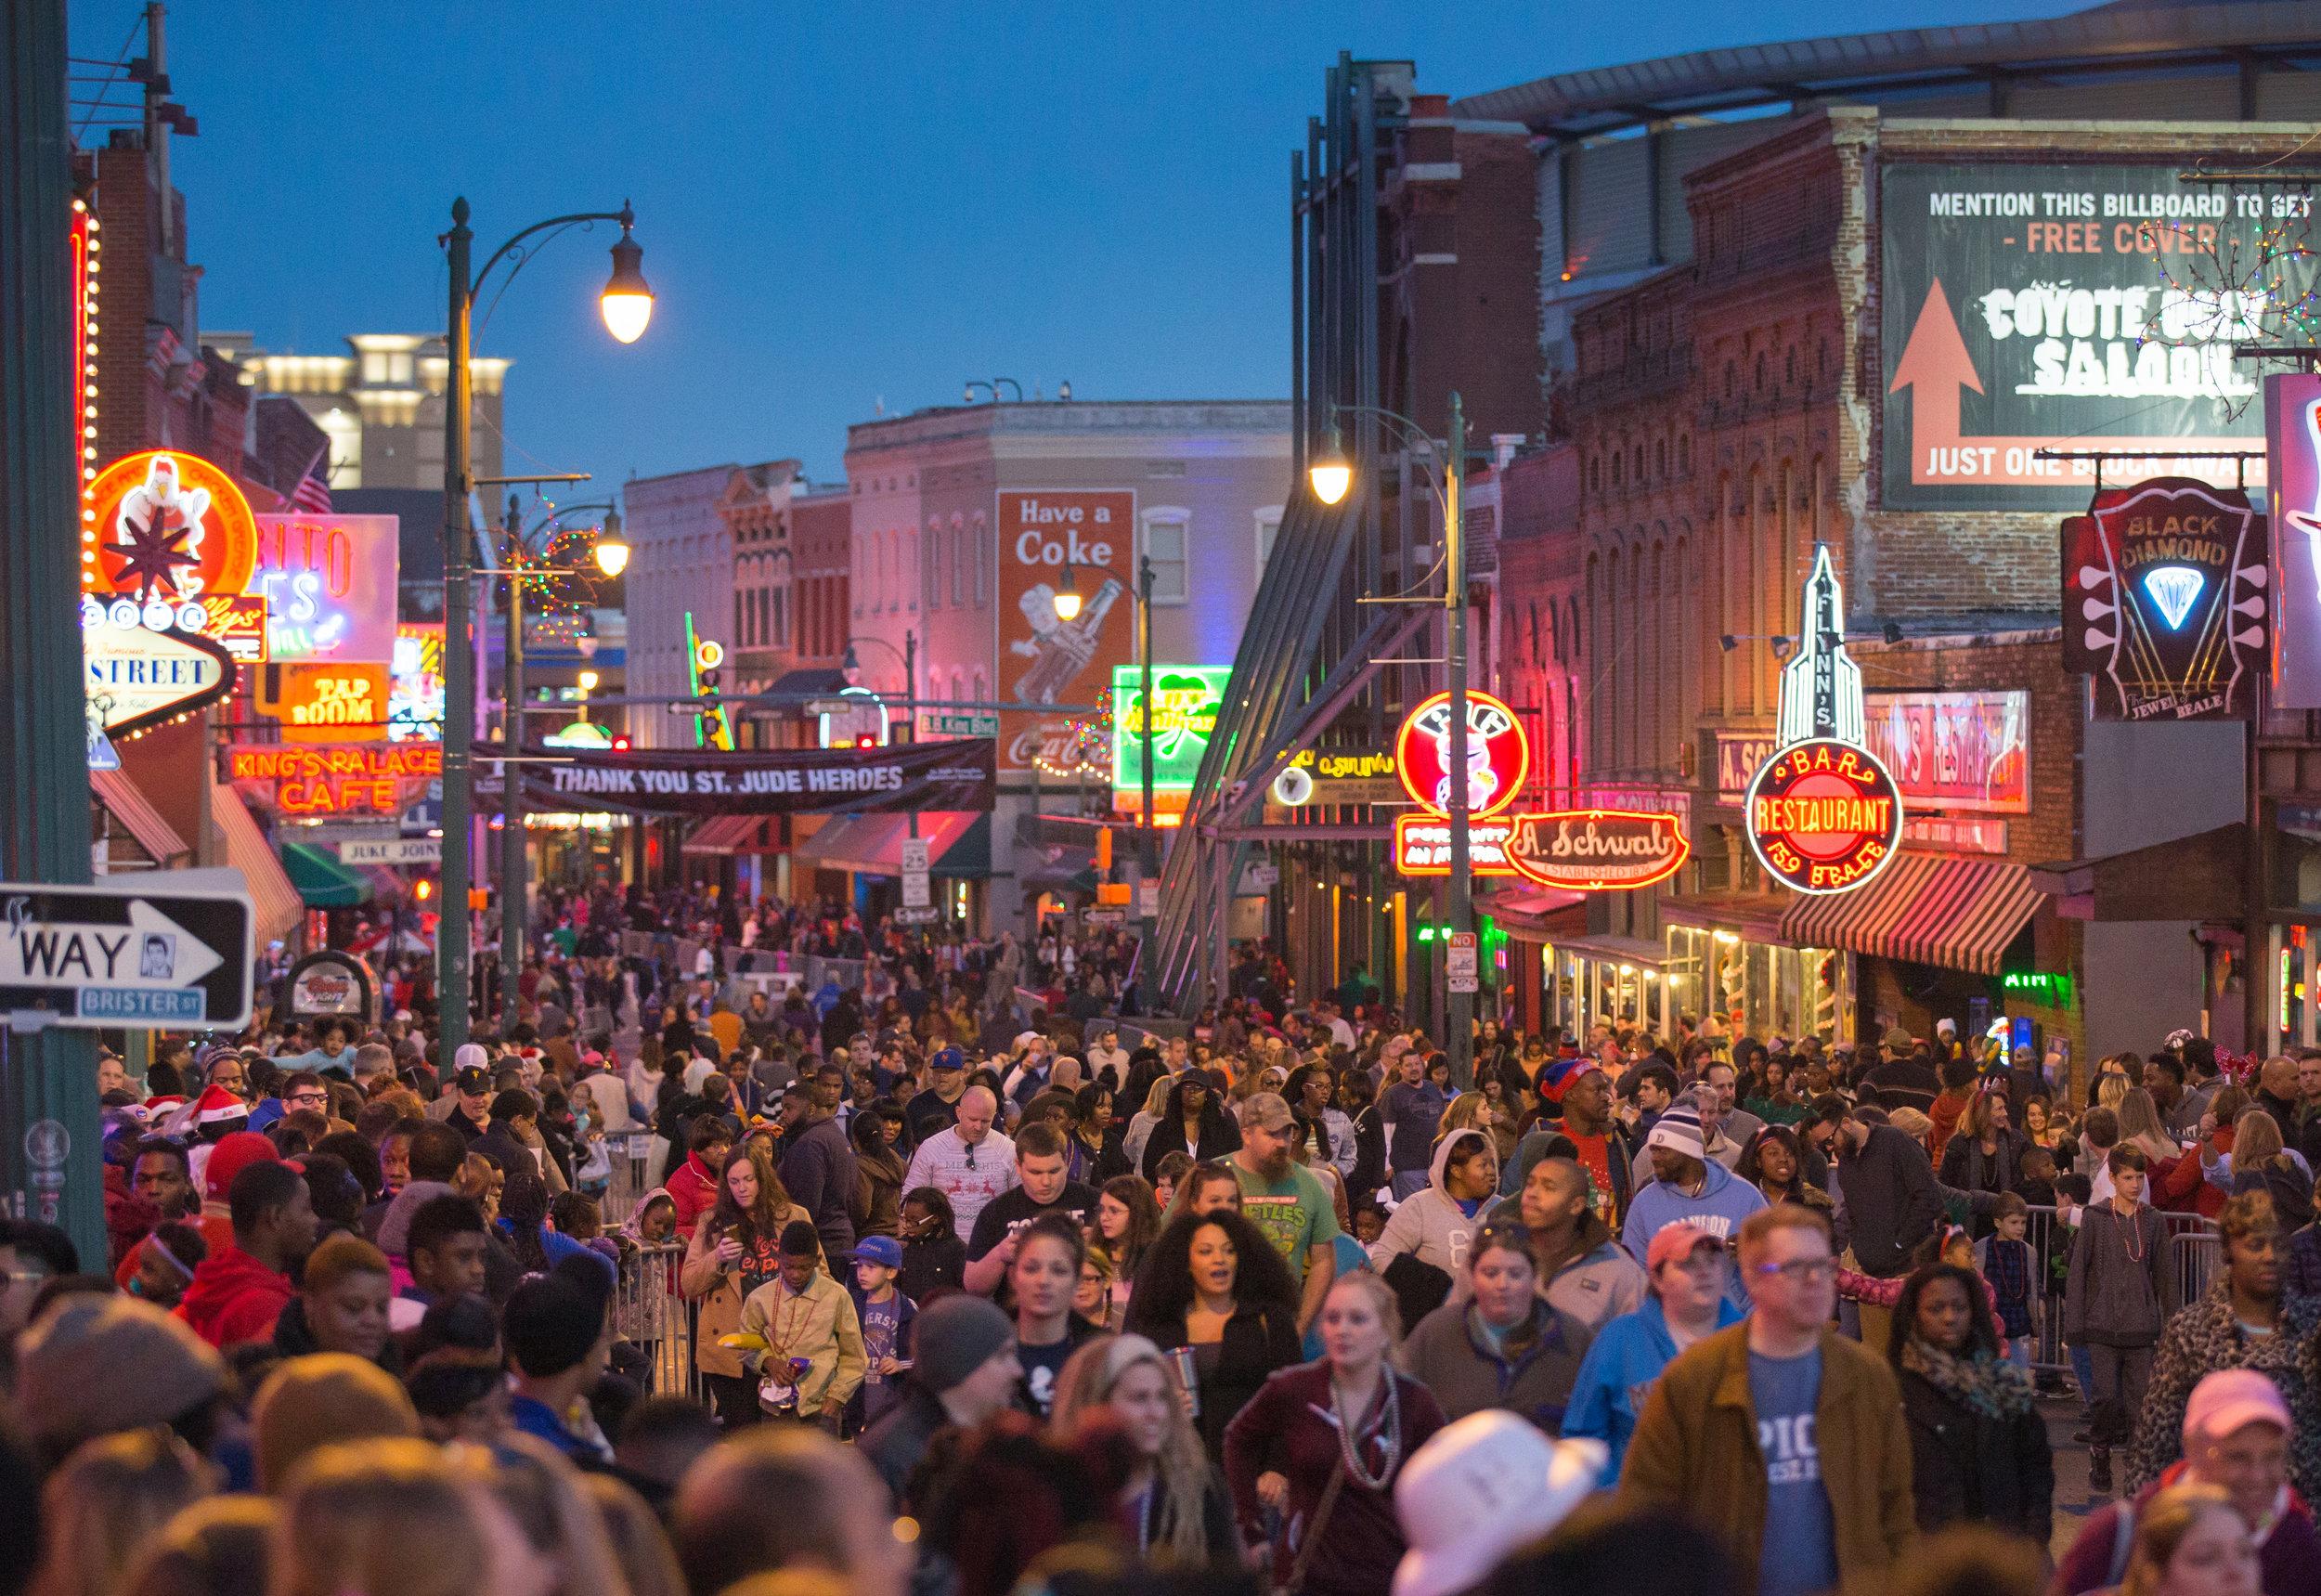 Packed_crowd_on_Beale_Street_S1BMM5_8JyzNOxYql8o1rHn.jpg